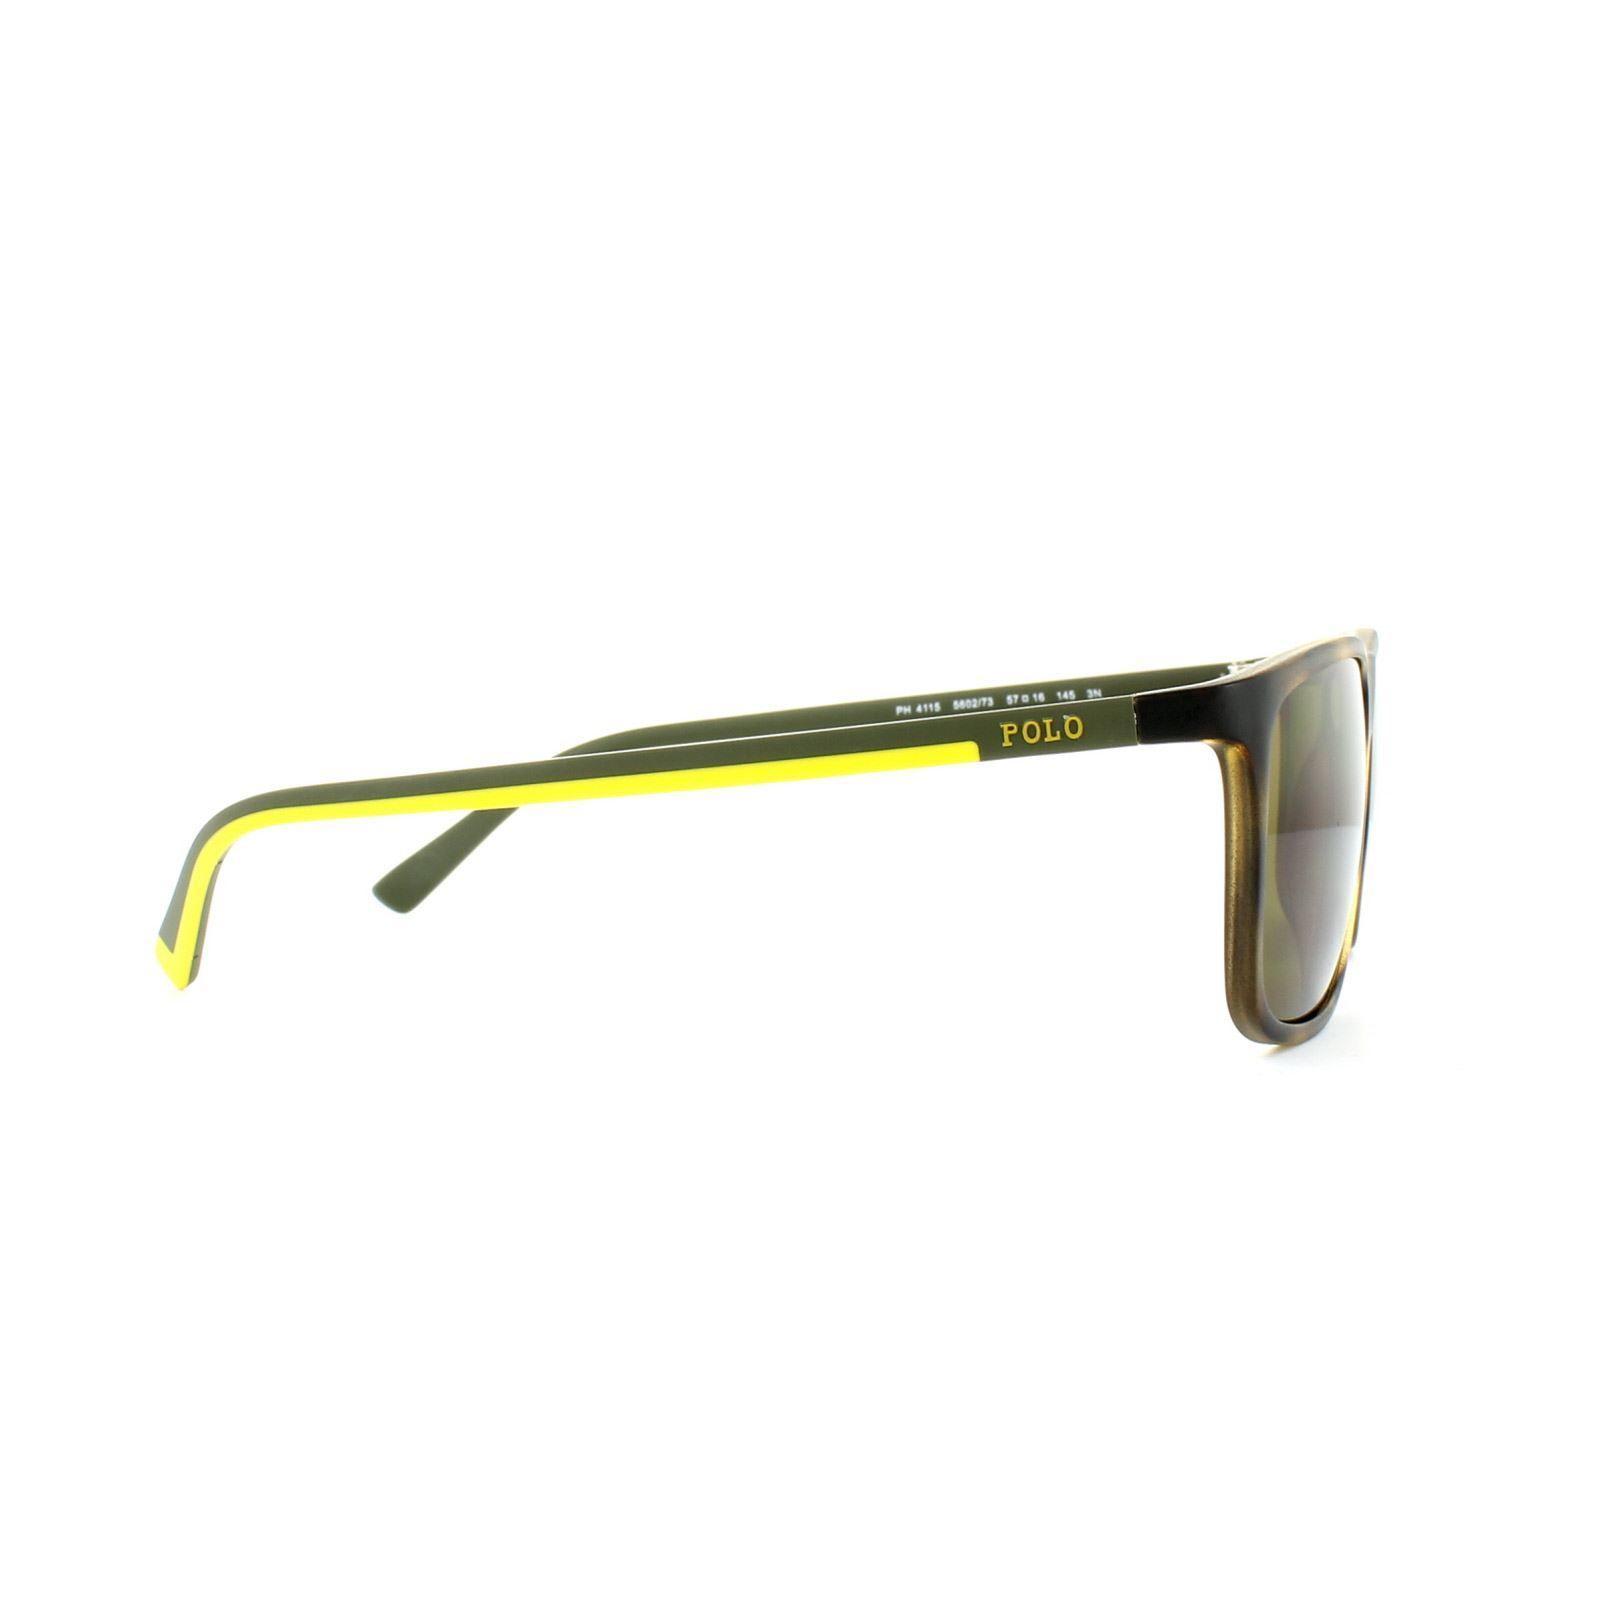 Polo Ralph Lauren Sunglasses 4115 560273 Vintage Dark Havana Olive Brown